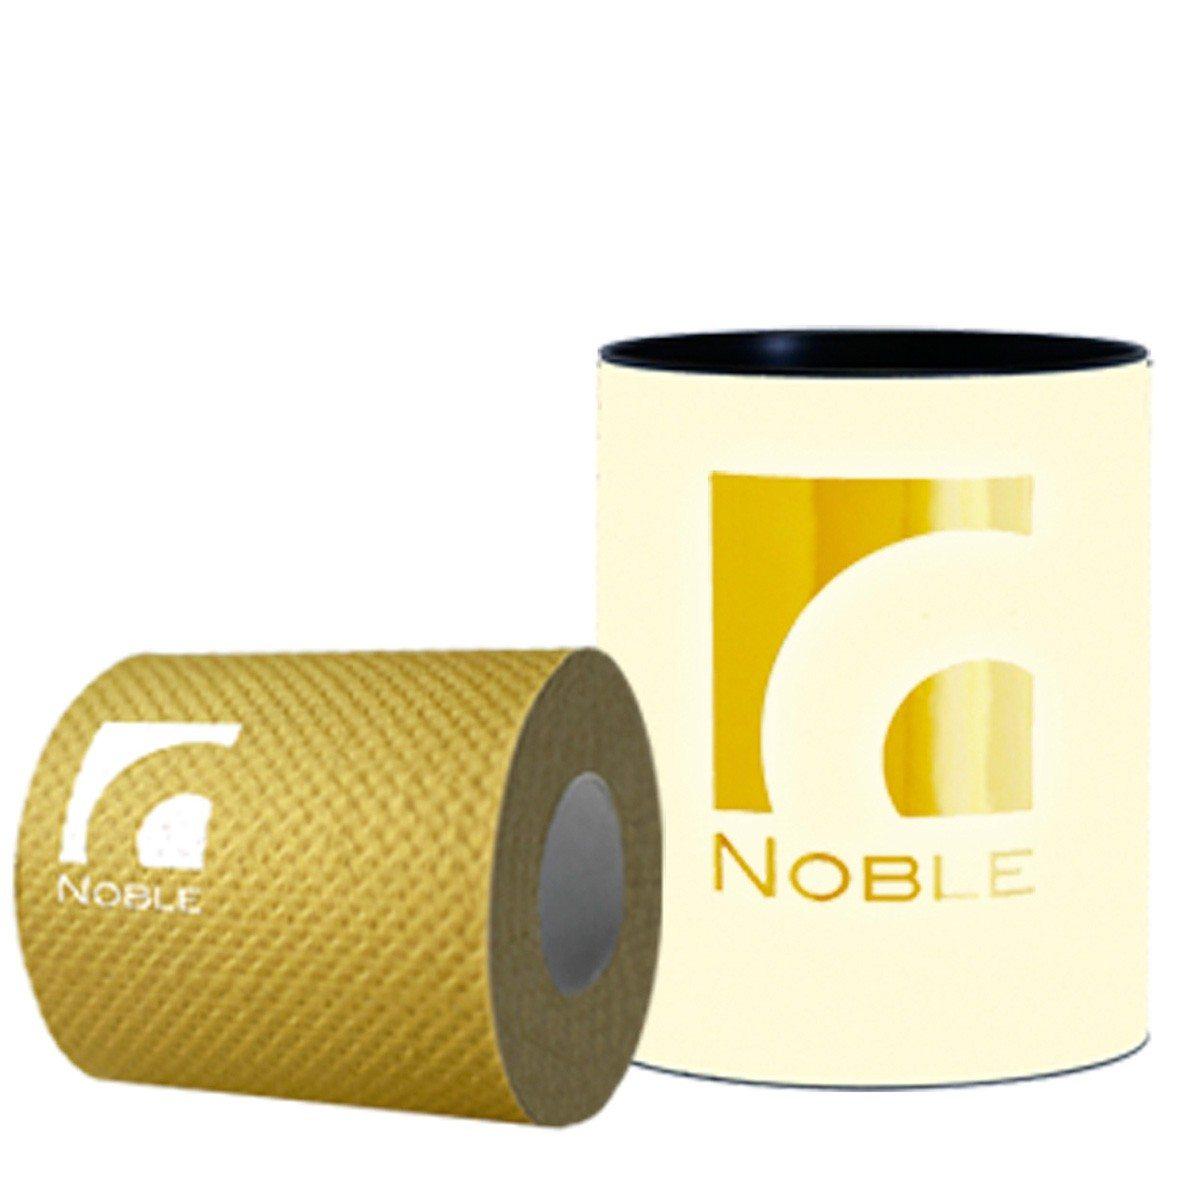 """Puur goud"" – Toiletpapier"